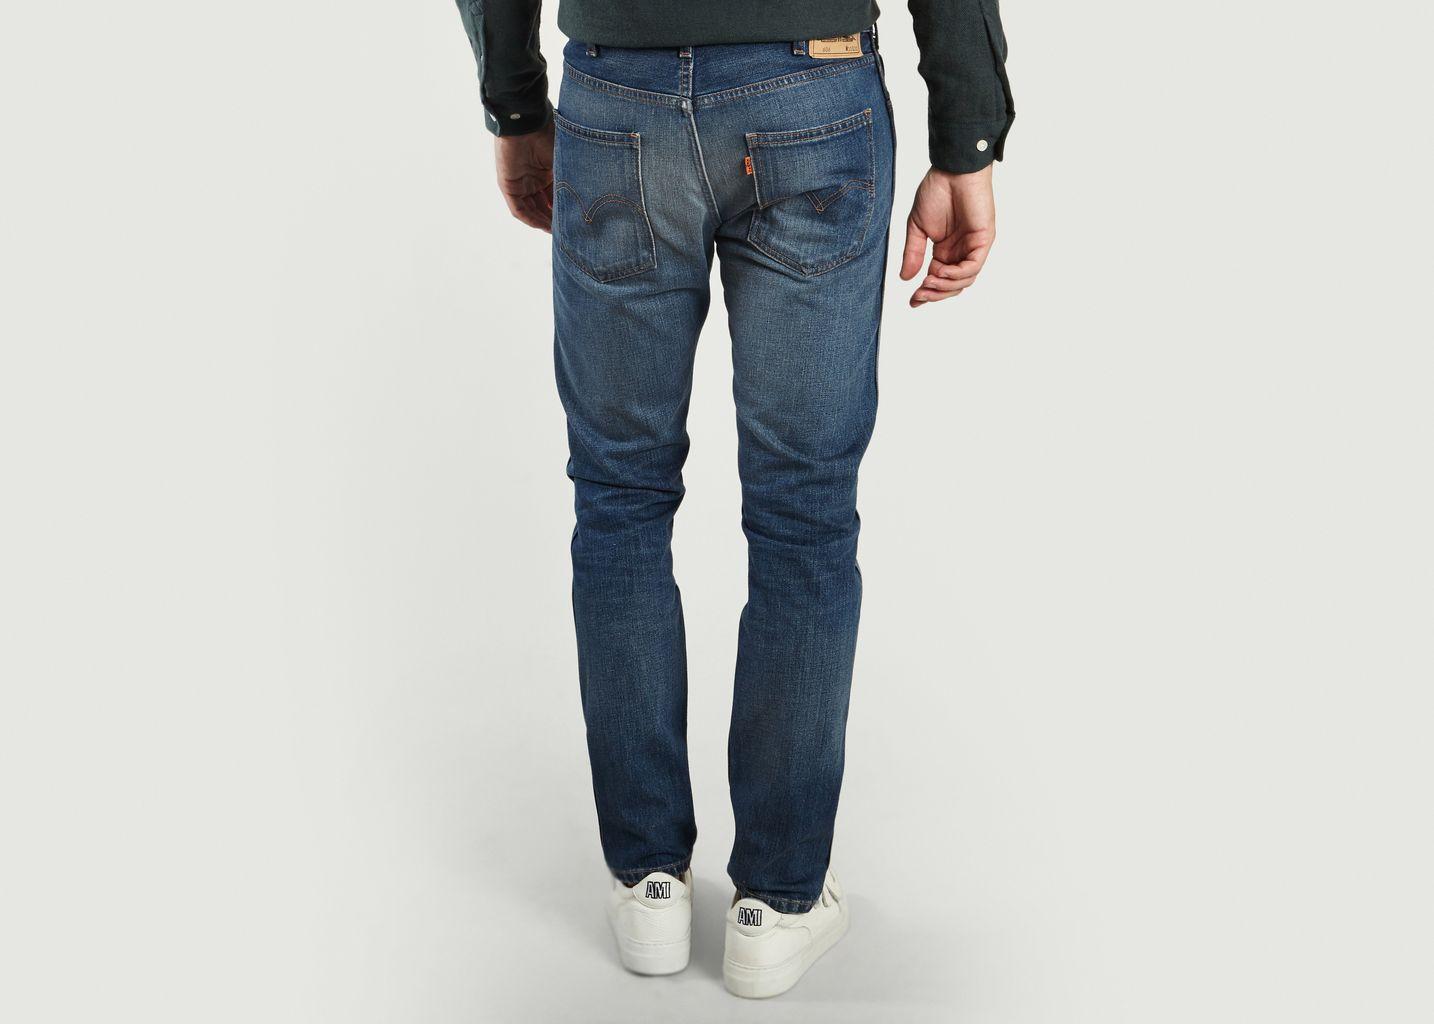 Jean 1969 606  - Levi's Vintage Clothing